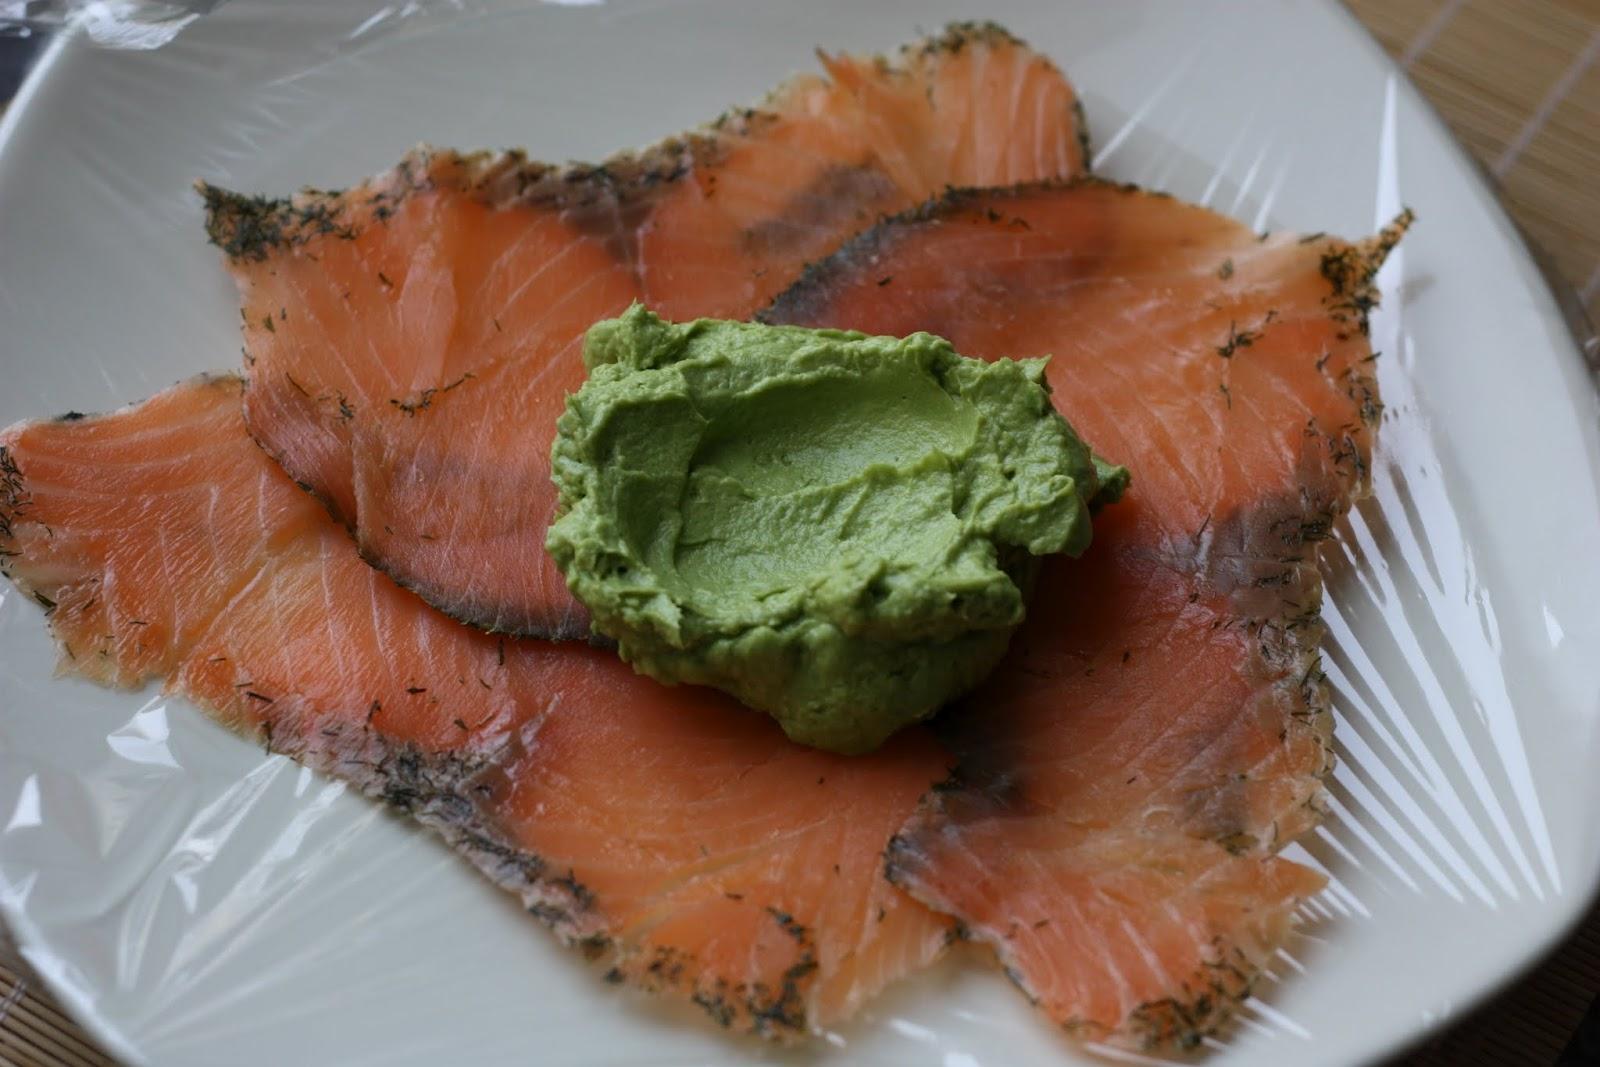 comment pr u00e9senter une assiette de saumon fum u00e9